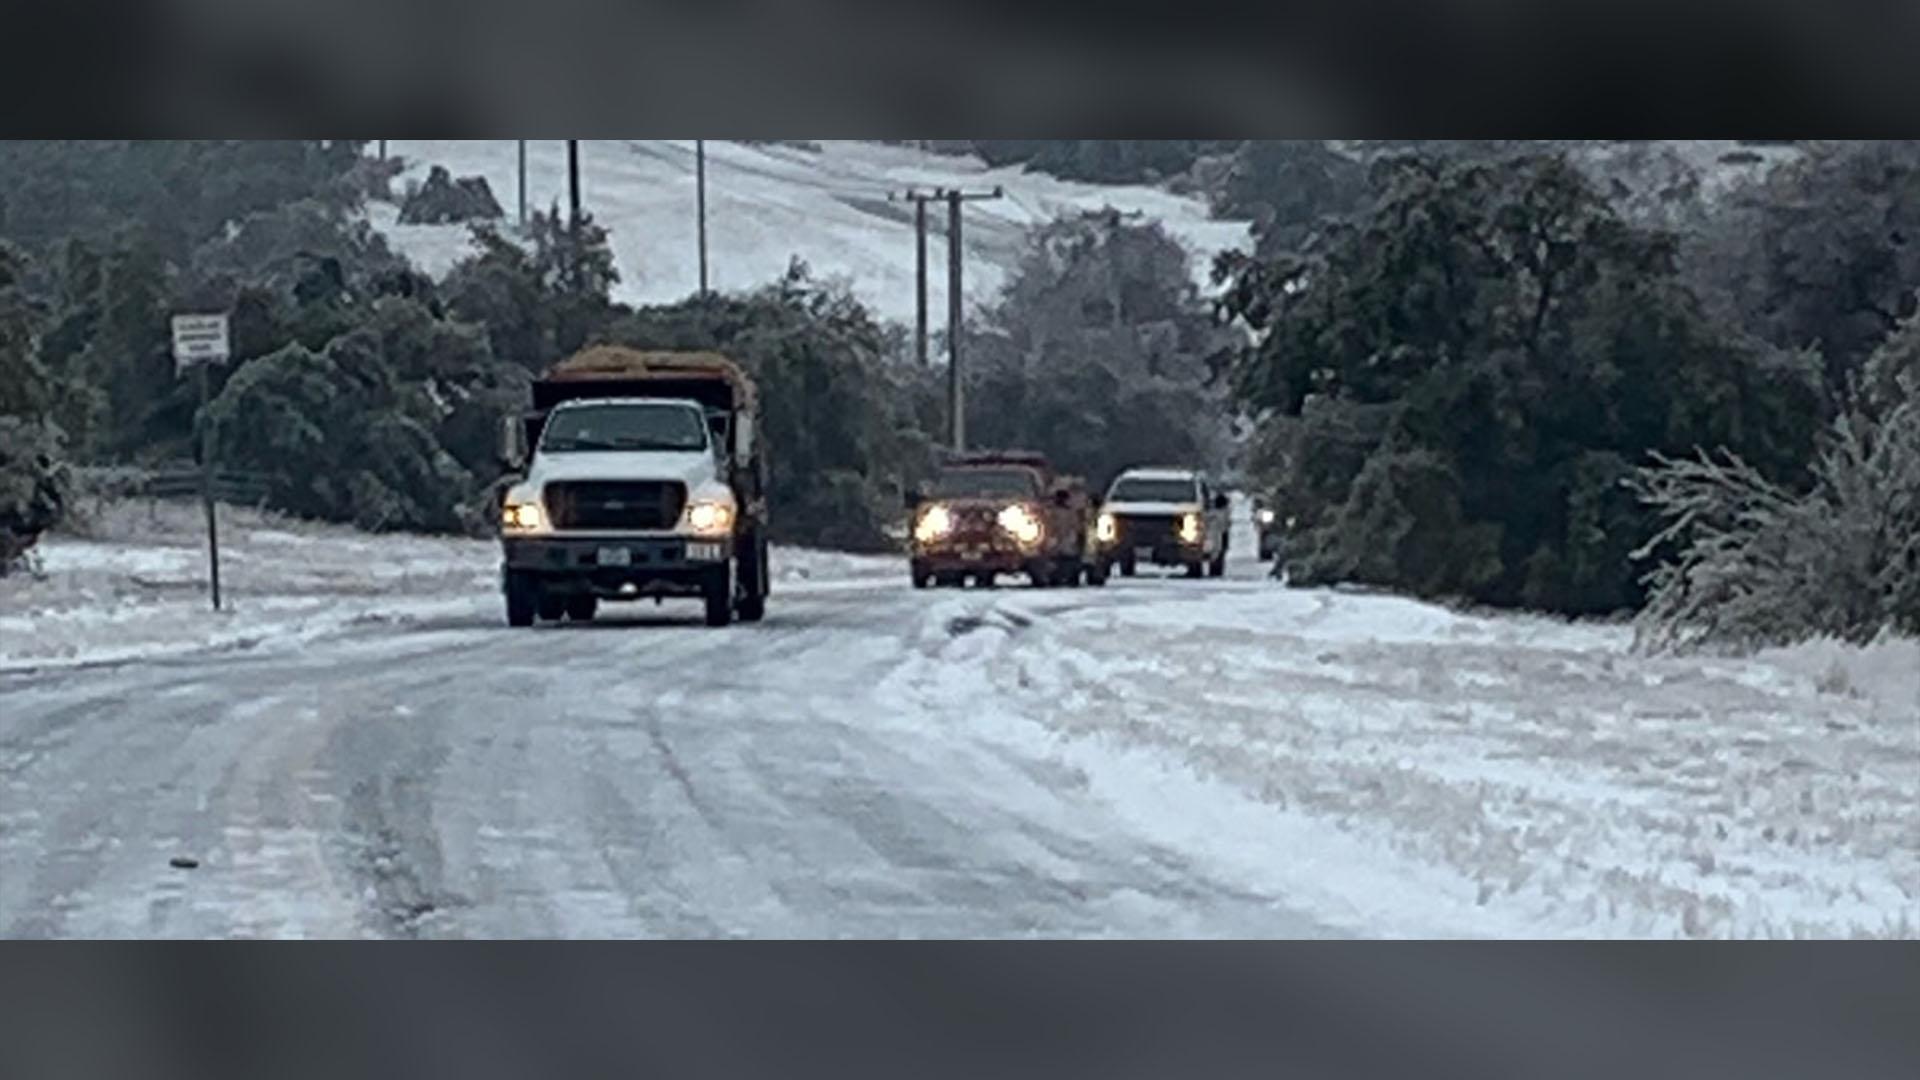 Round Rock Utilities team hauls a 1,000-gallon fuel tank through snowy terrain